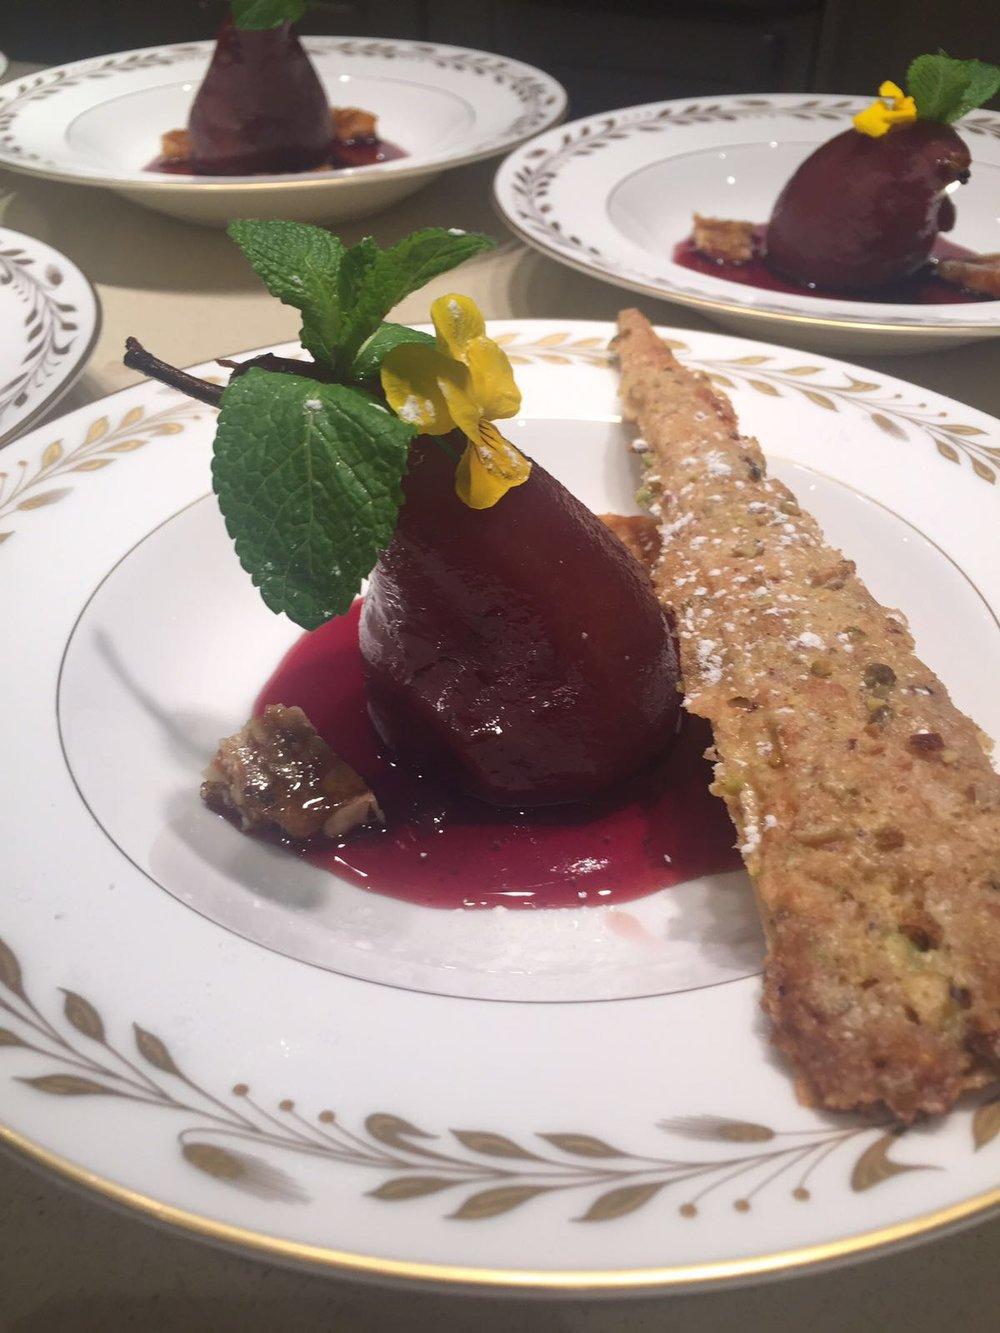 puddings-sarah-symington-catering-17.jpg